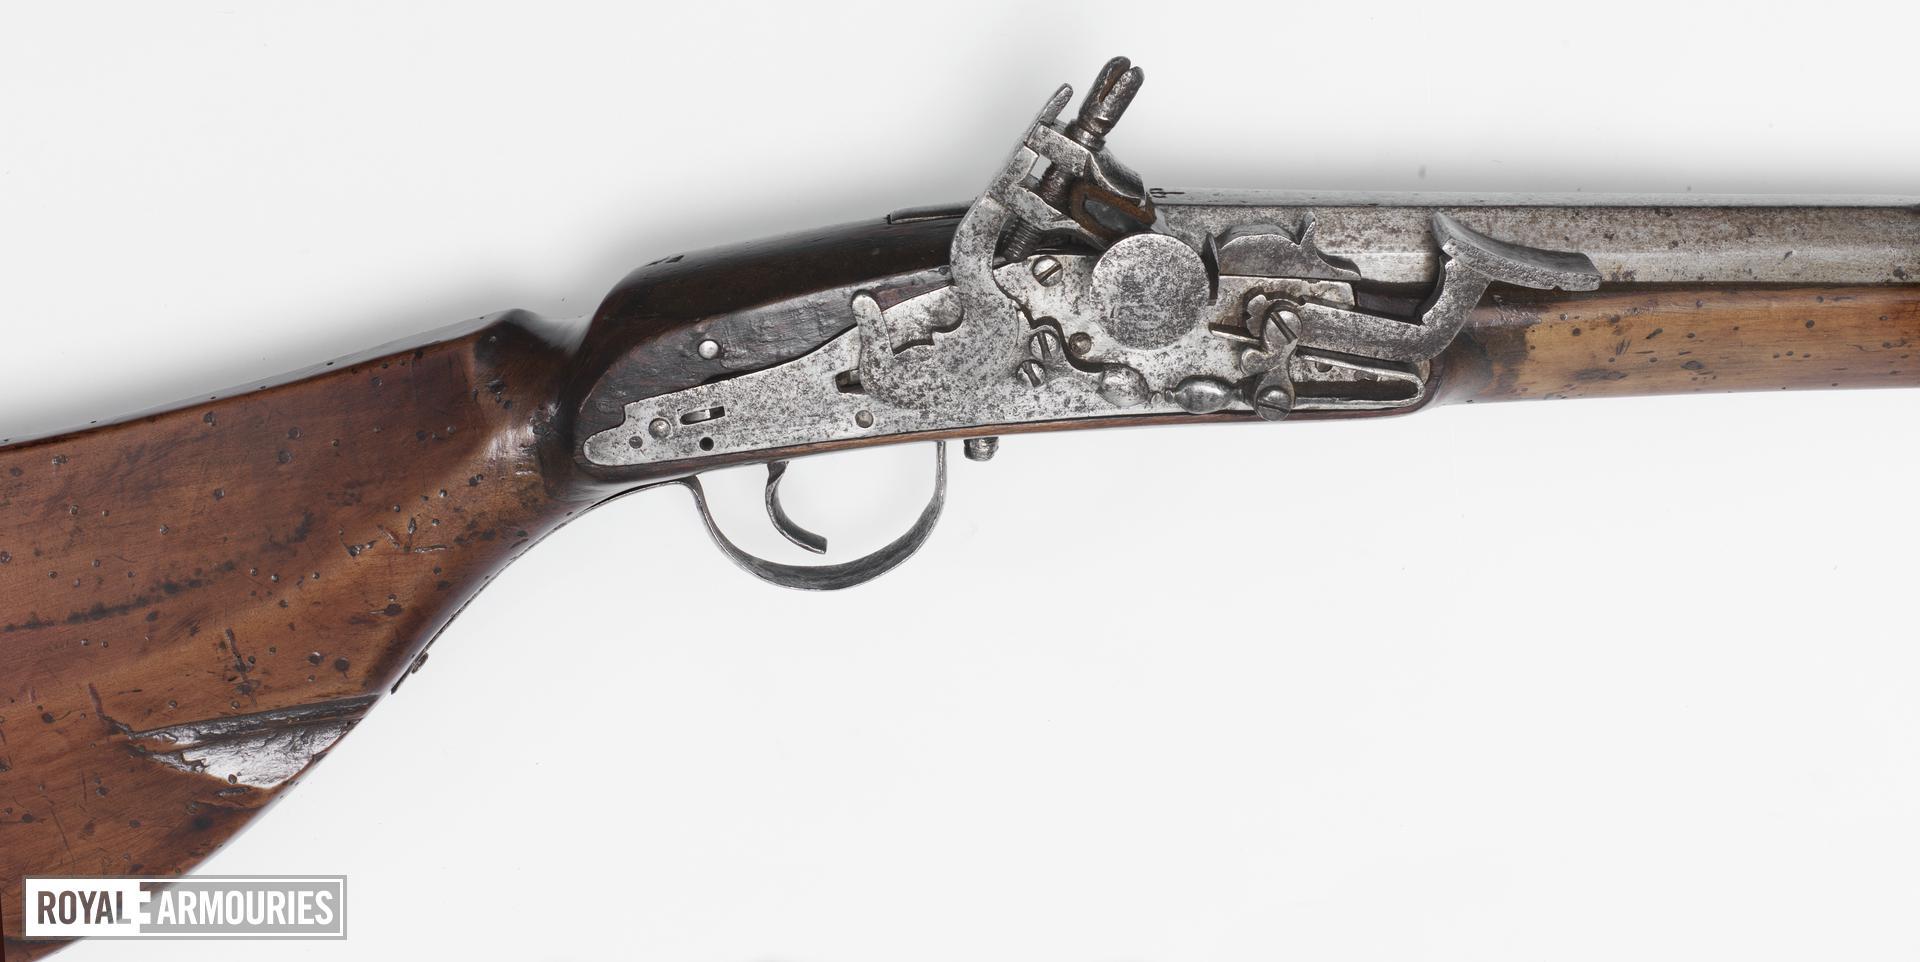 Flintlock gun Snaphaunce type